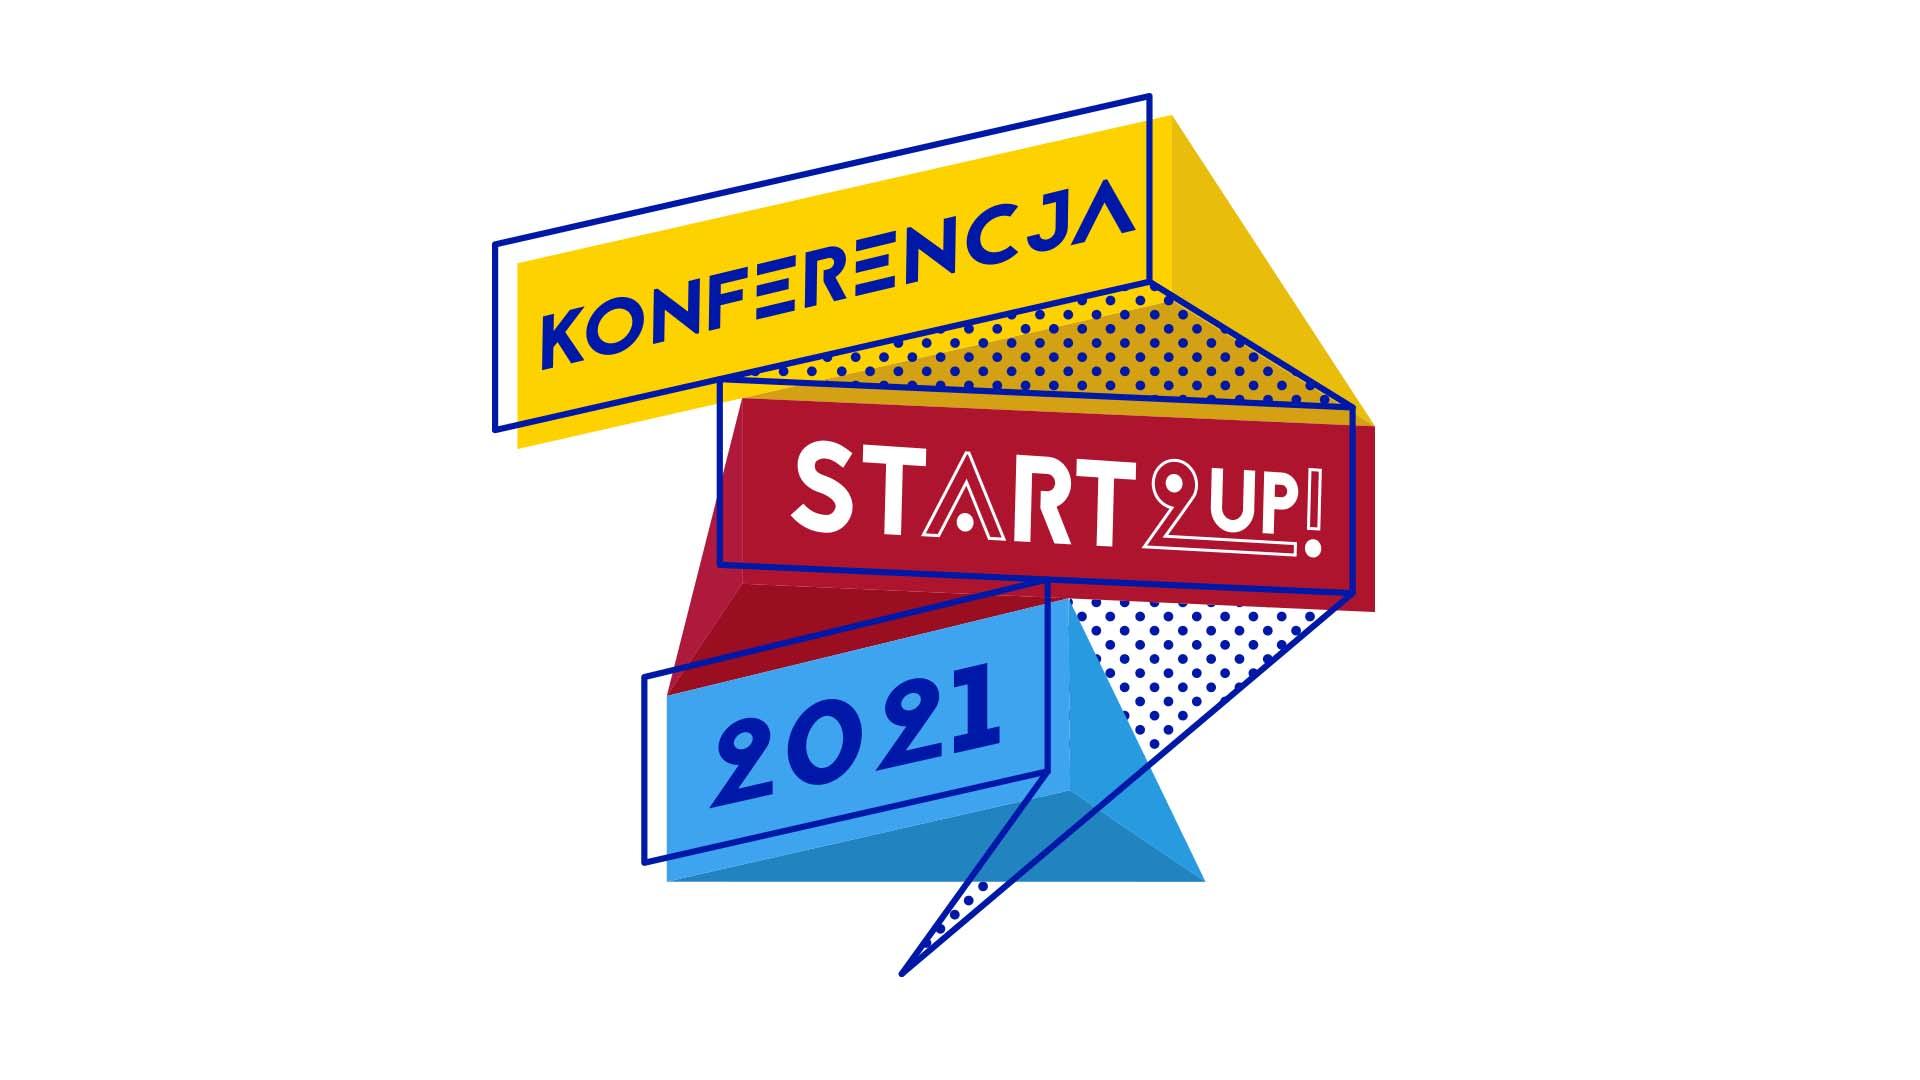 26 października, konferencja START2UP!